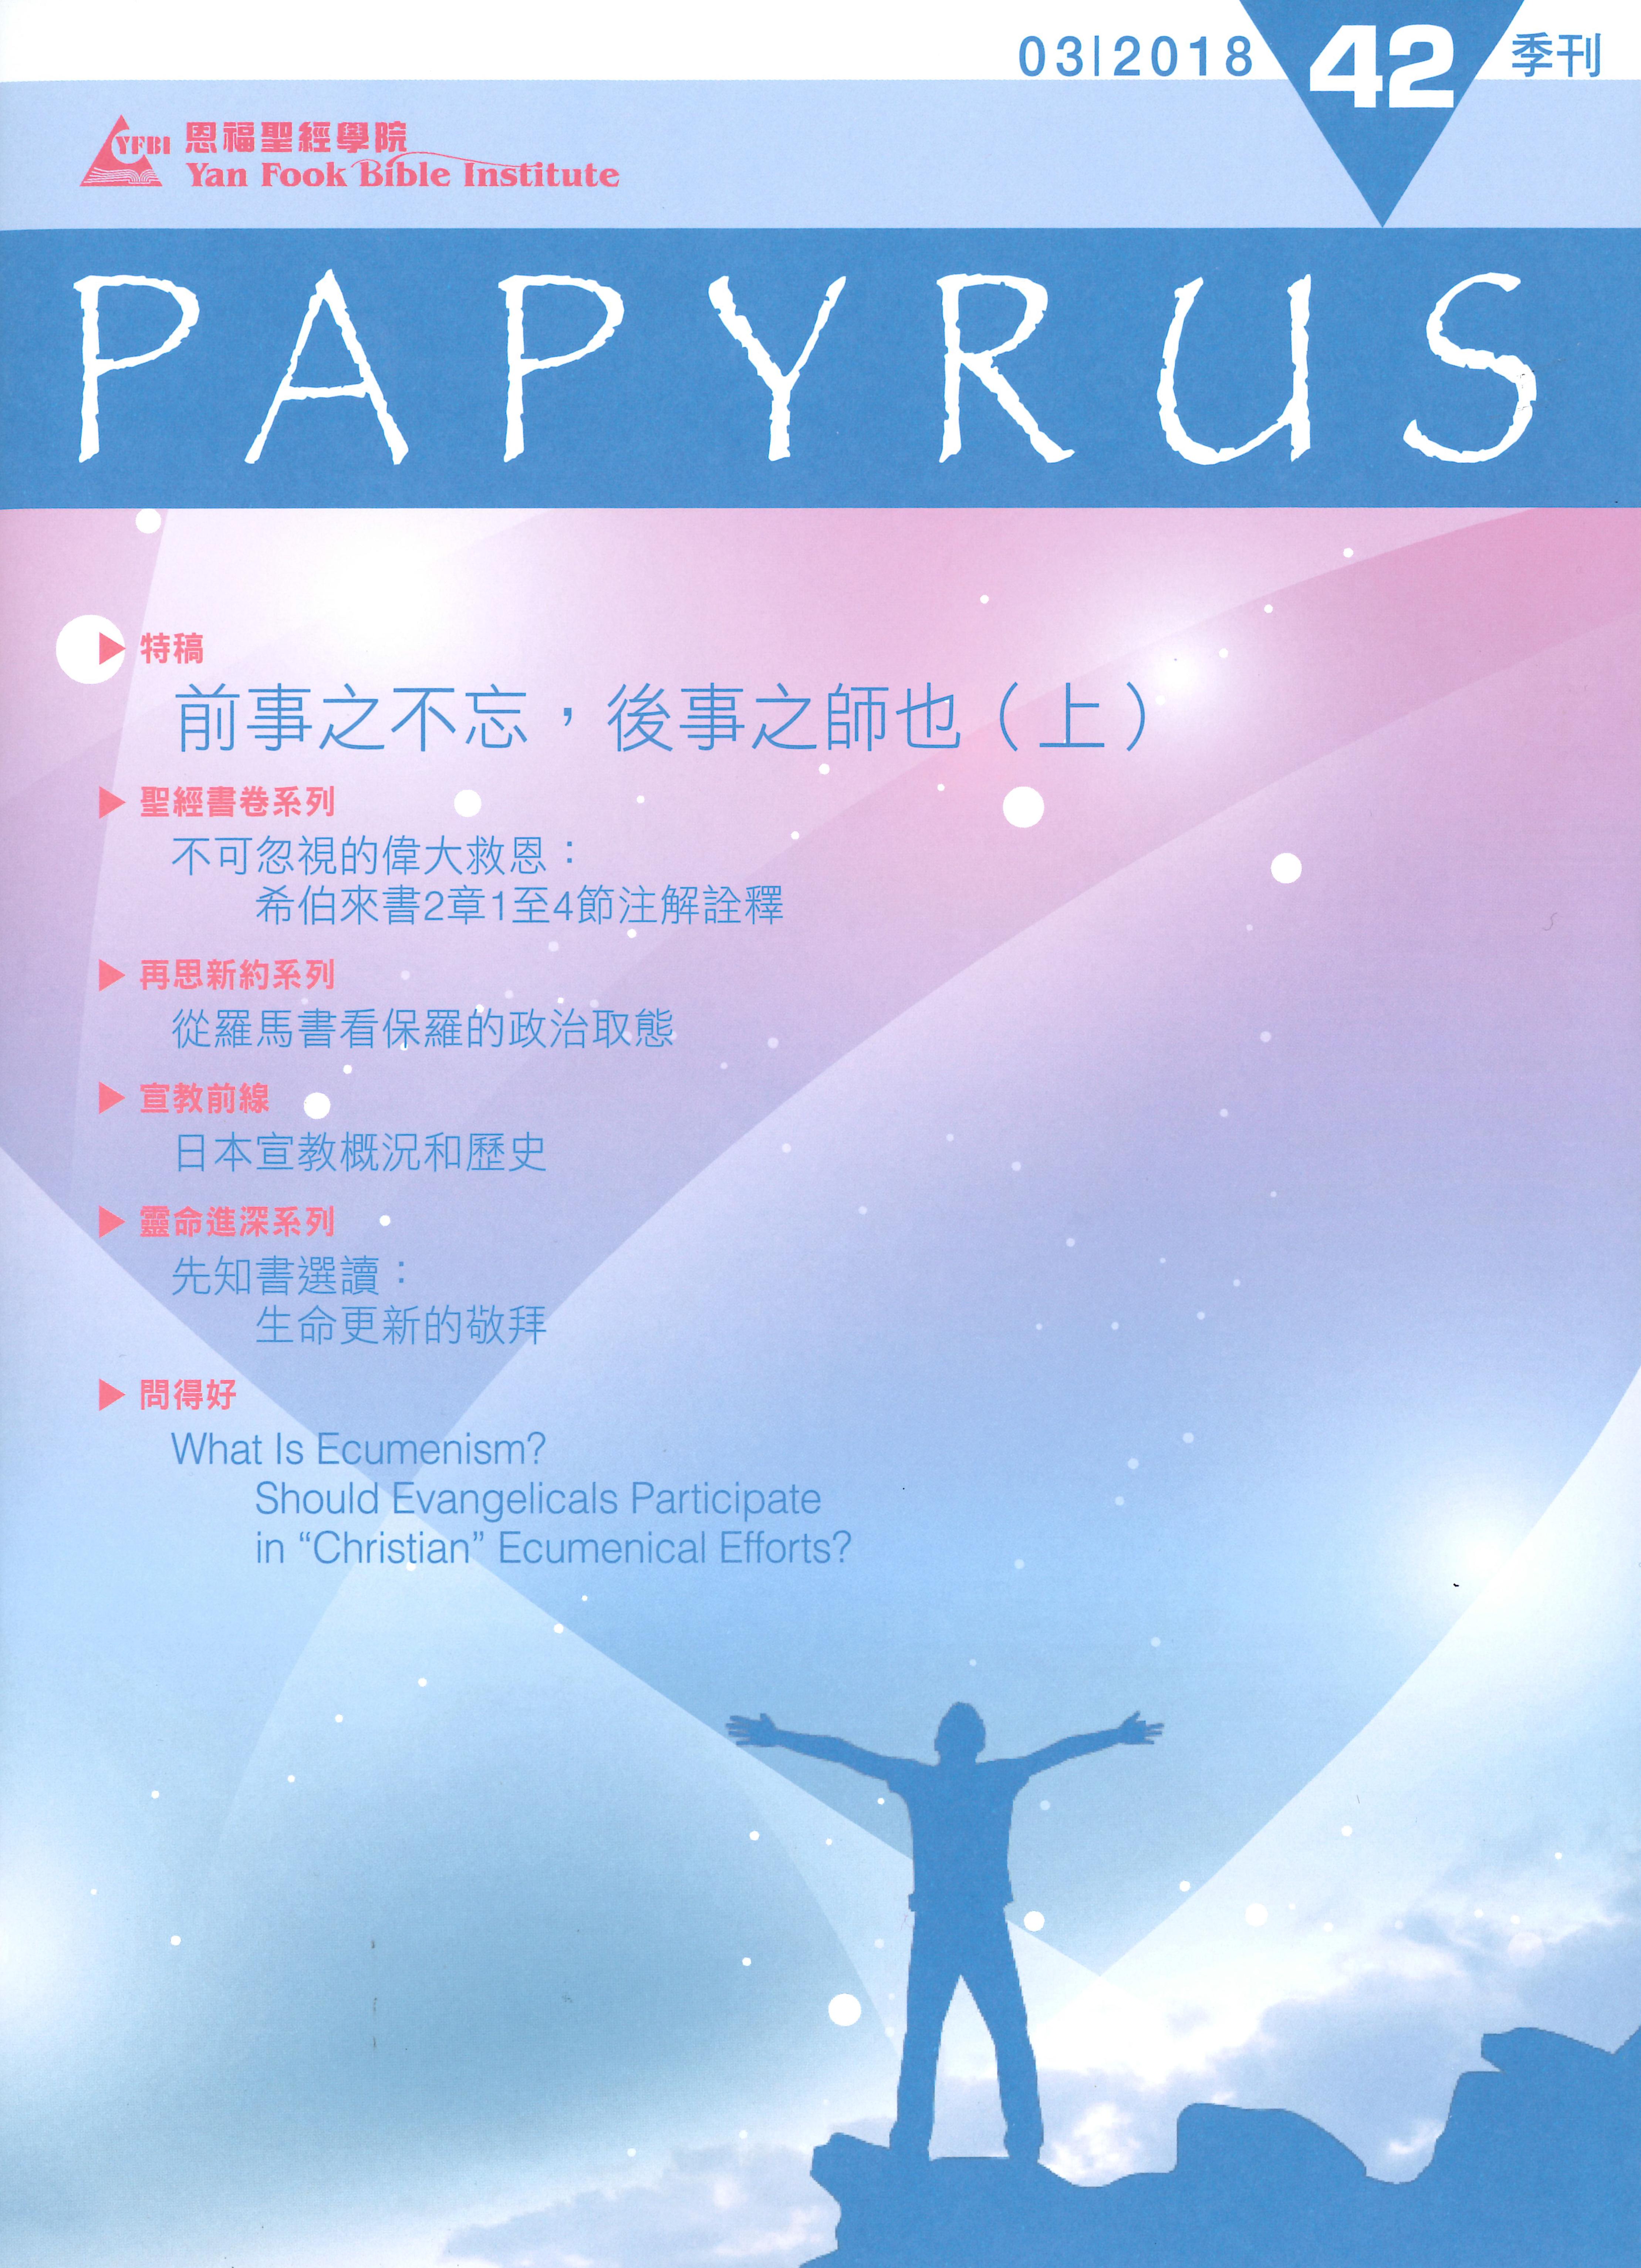 Papyrus 42